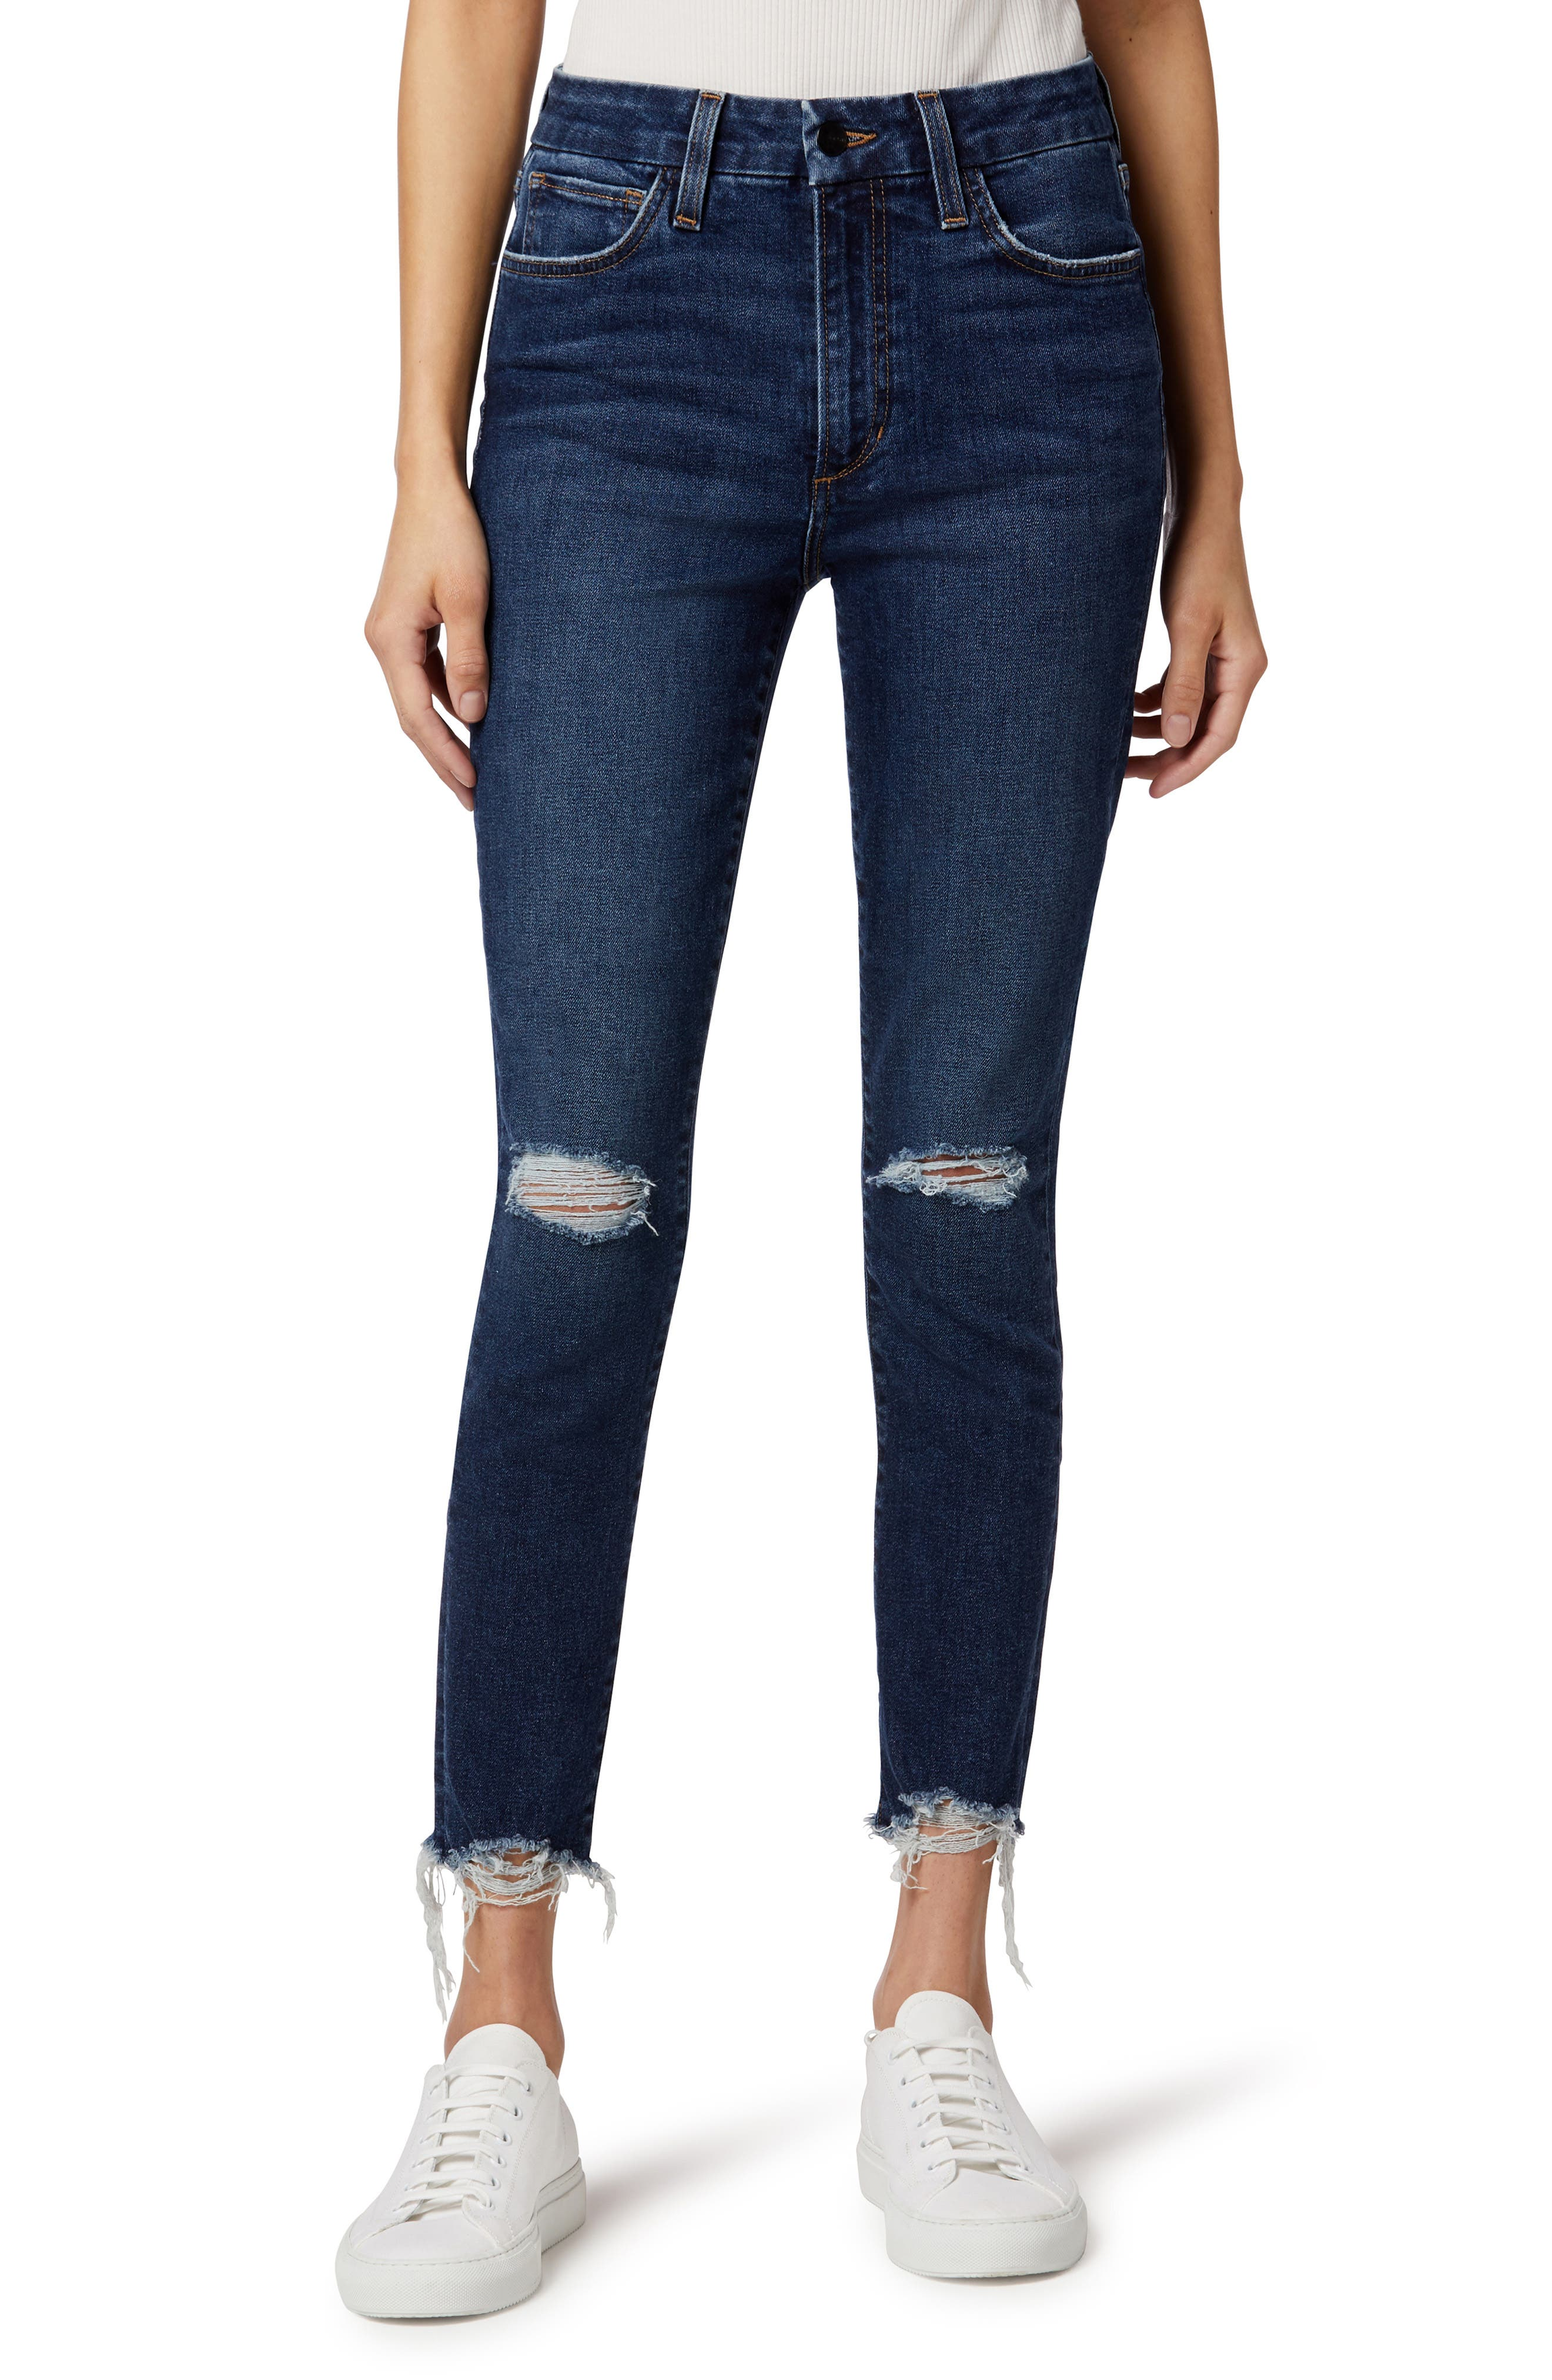 The Hi Honey High Waist Curvy Skinny Crop Jeans